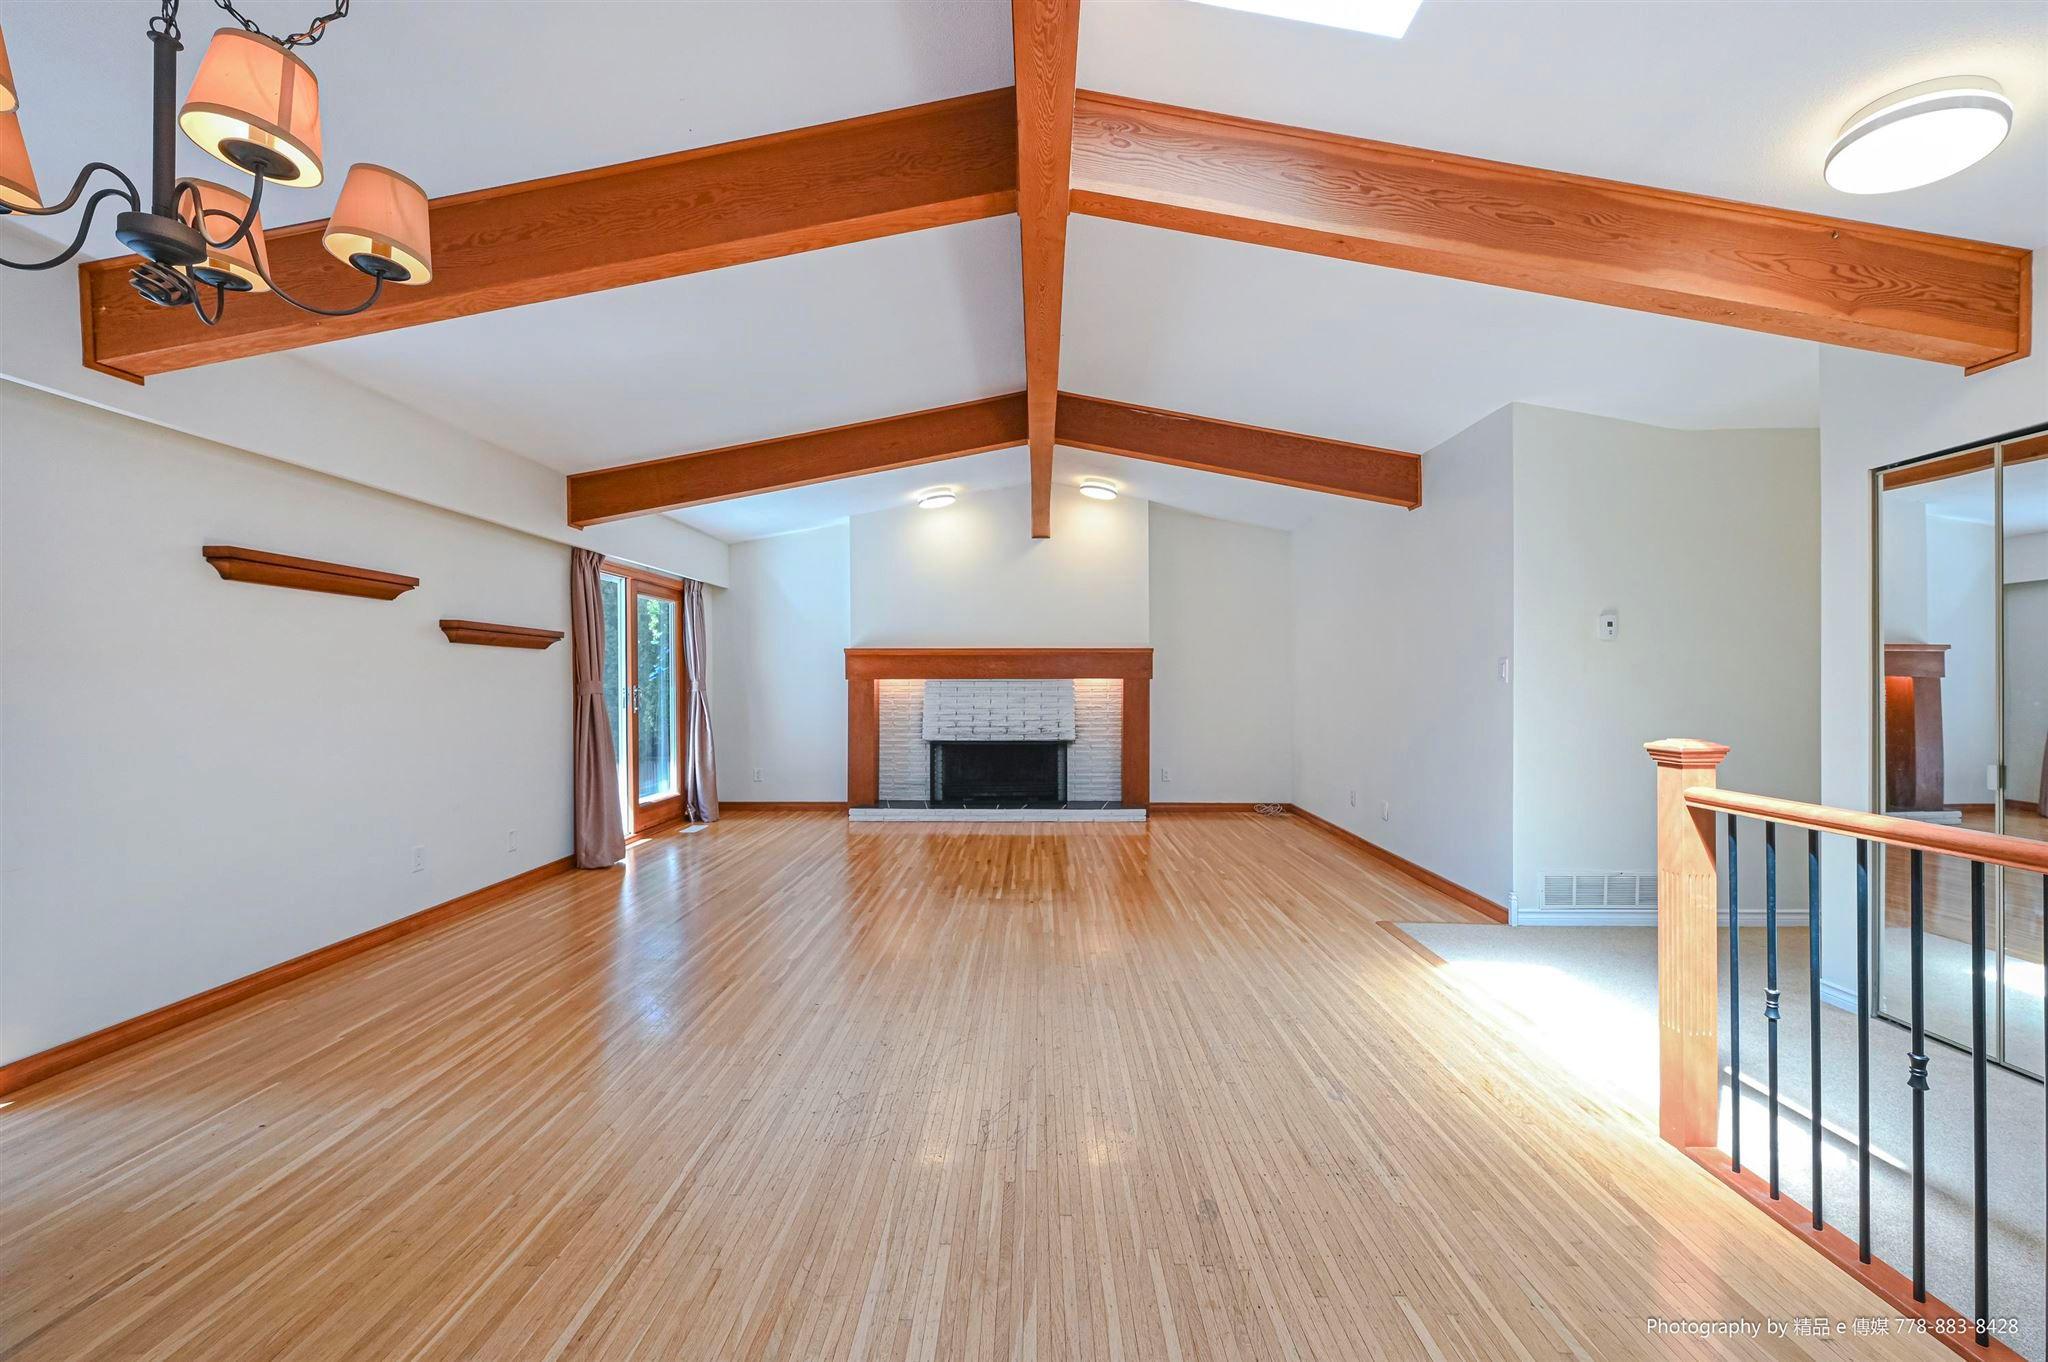 Main Photo: 1493 54 Street in Delta: Cliff Drive House for sale (Tsawwassen)  : MLS®# R2599726